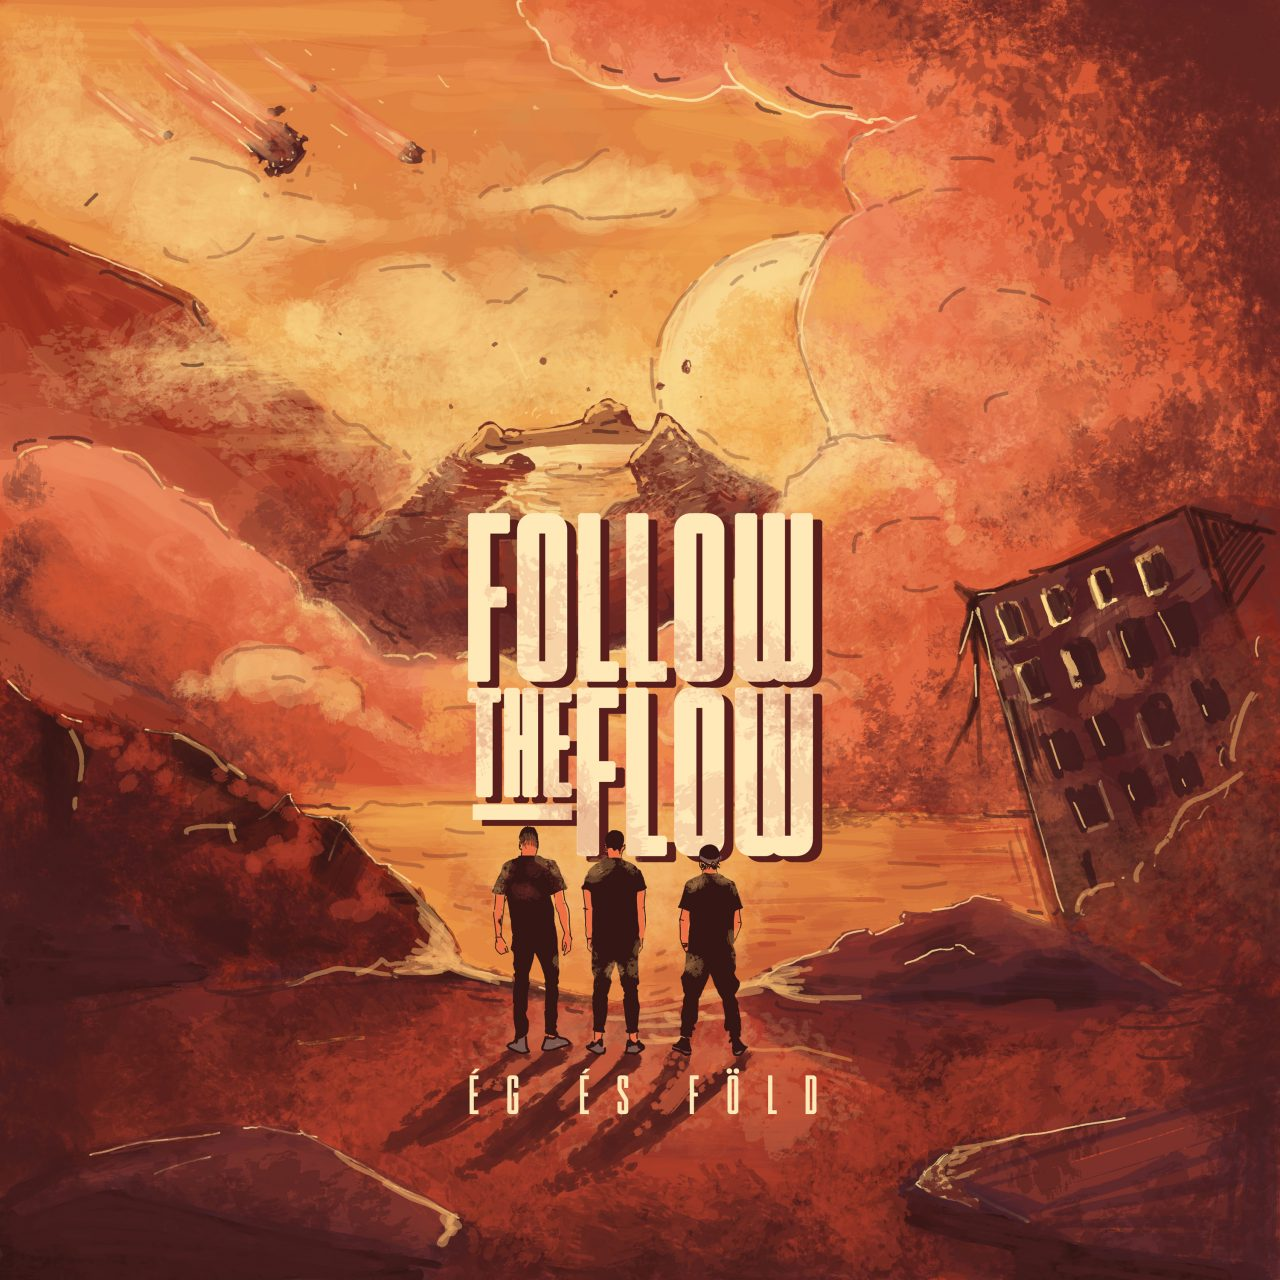 follow_the_flow_eg_es_fold